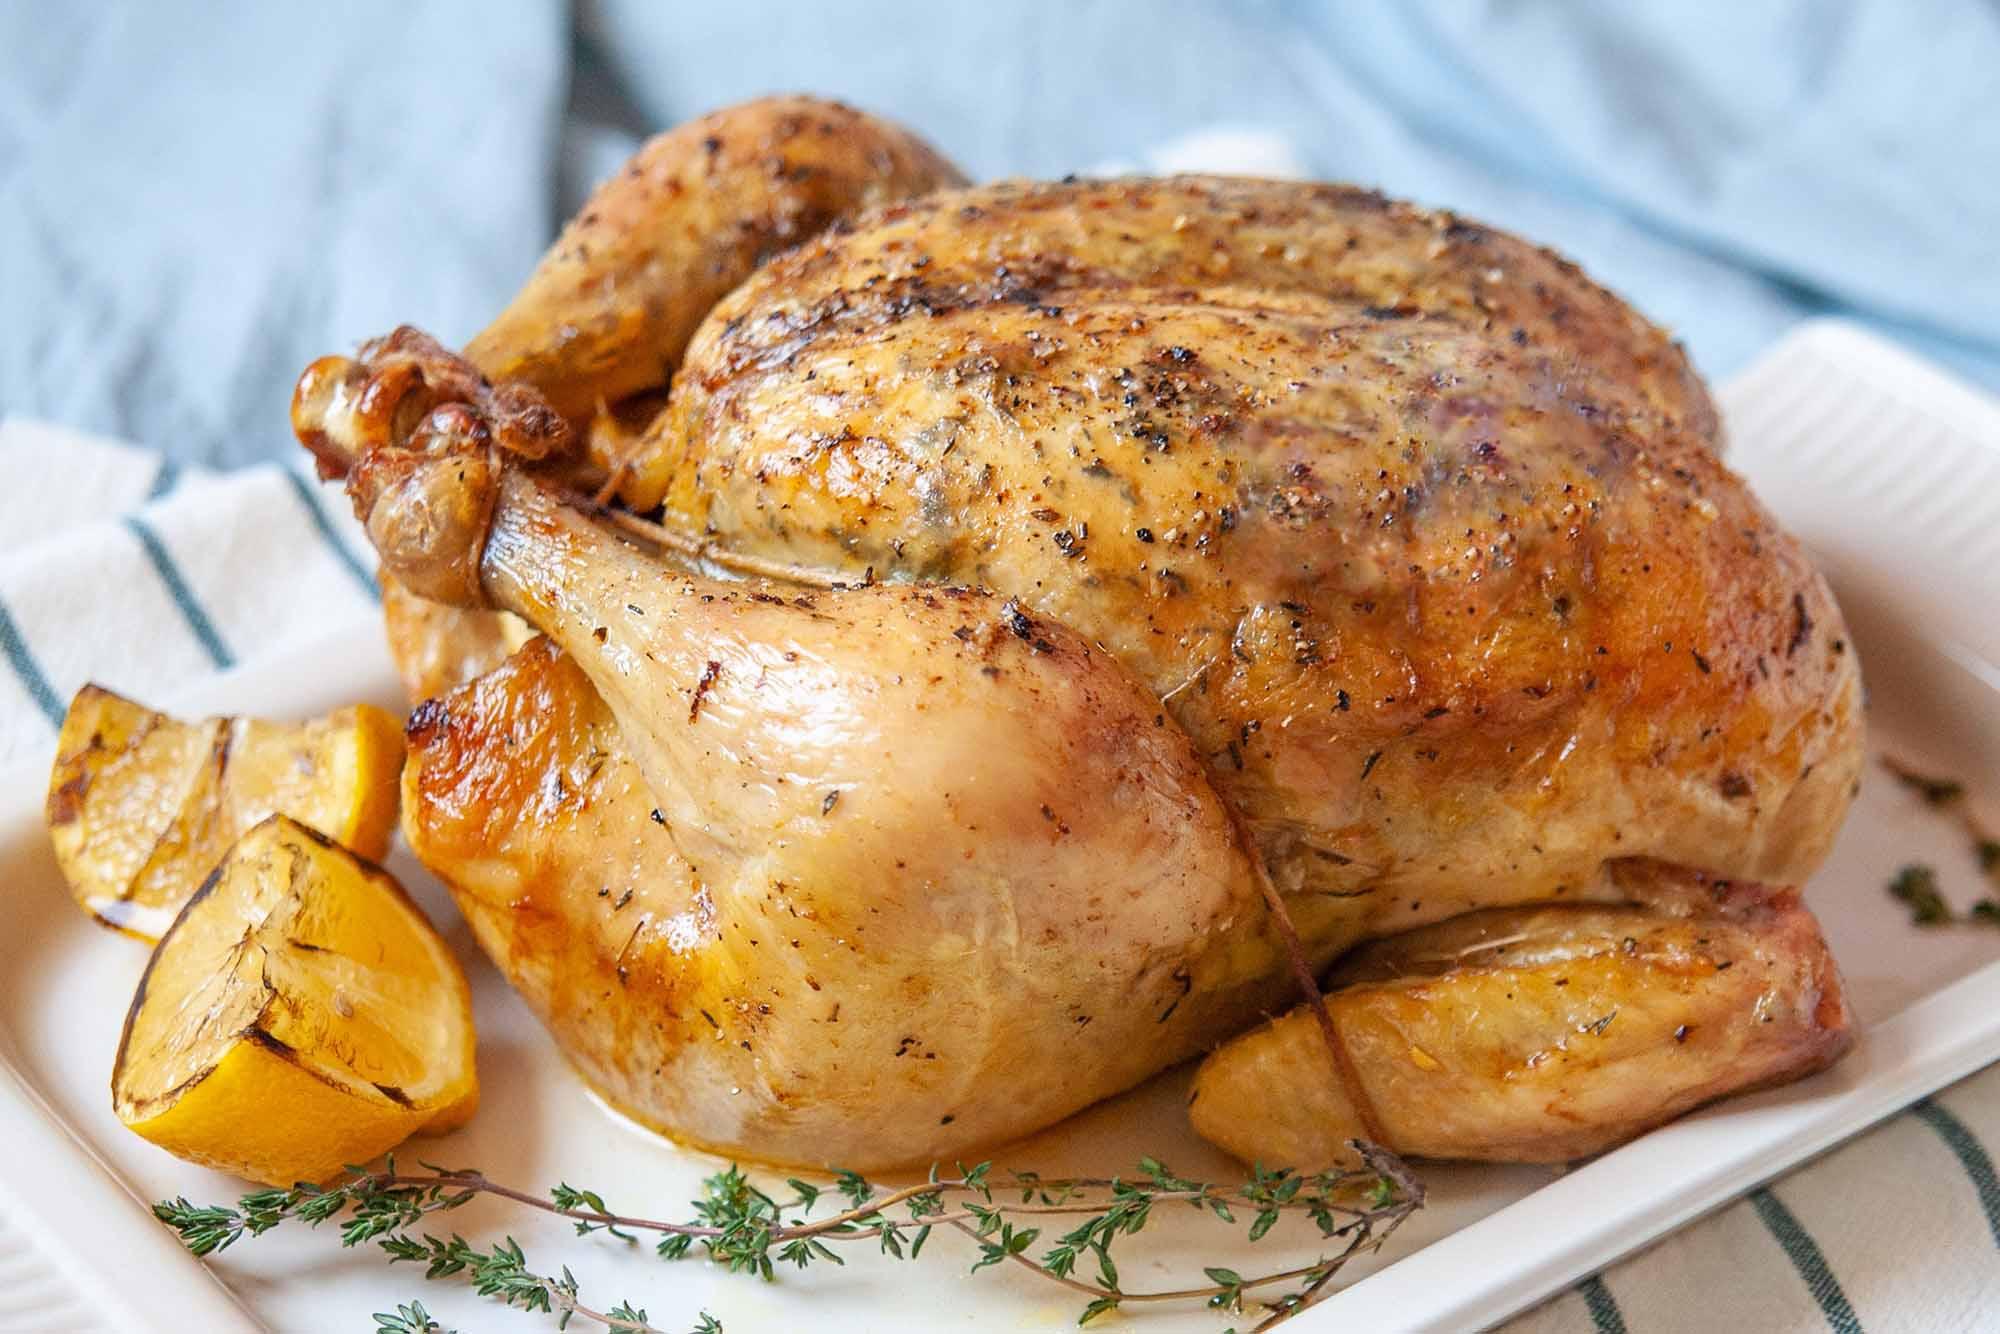 Silver Spoon's Roast chicken with lemons is a treat